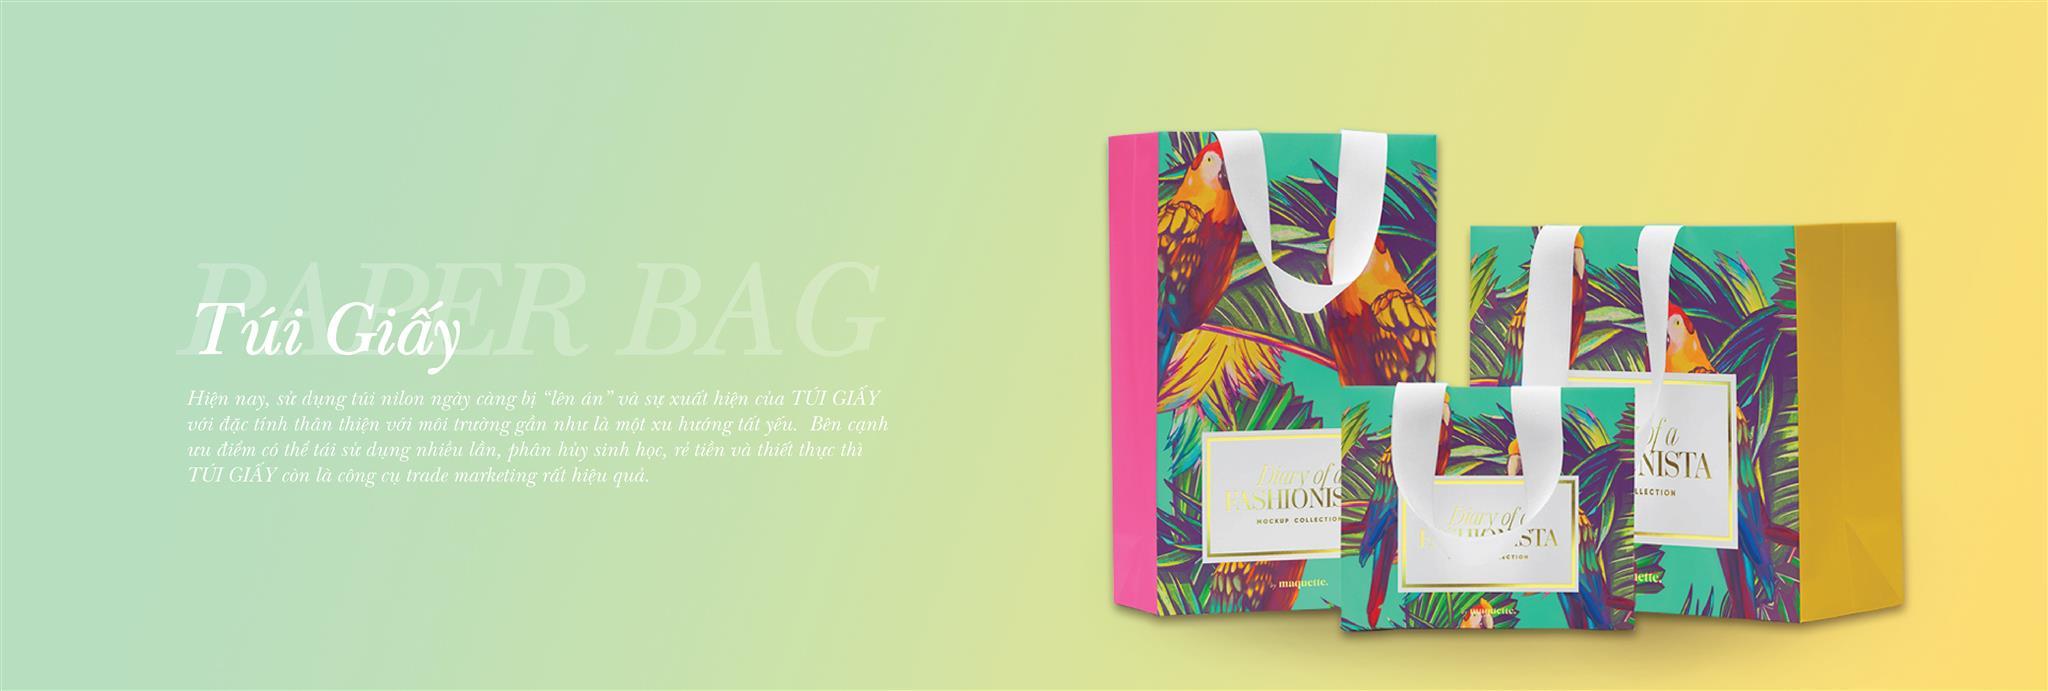 Túi giấy - Paper bags